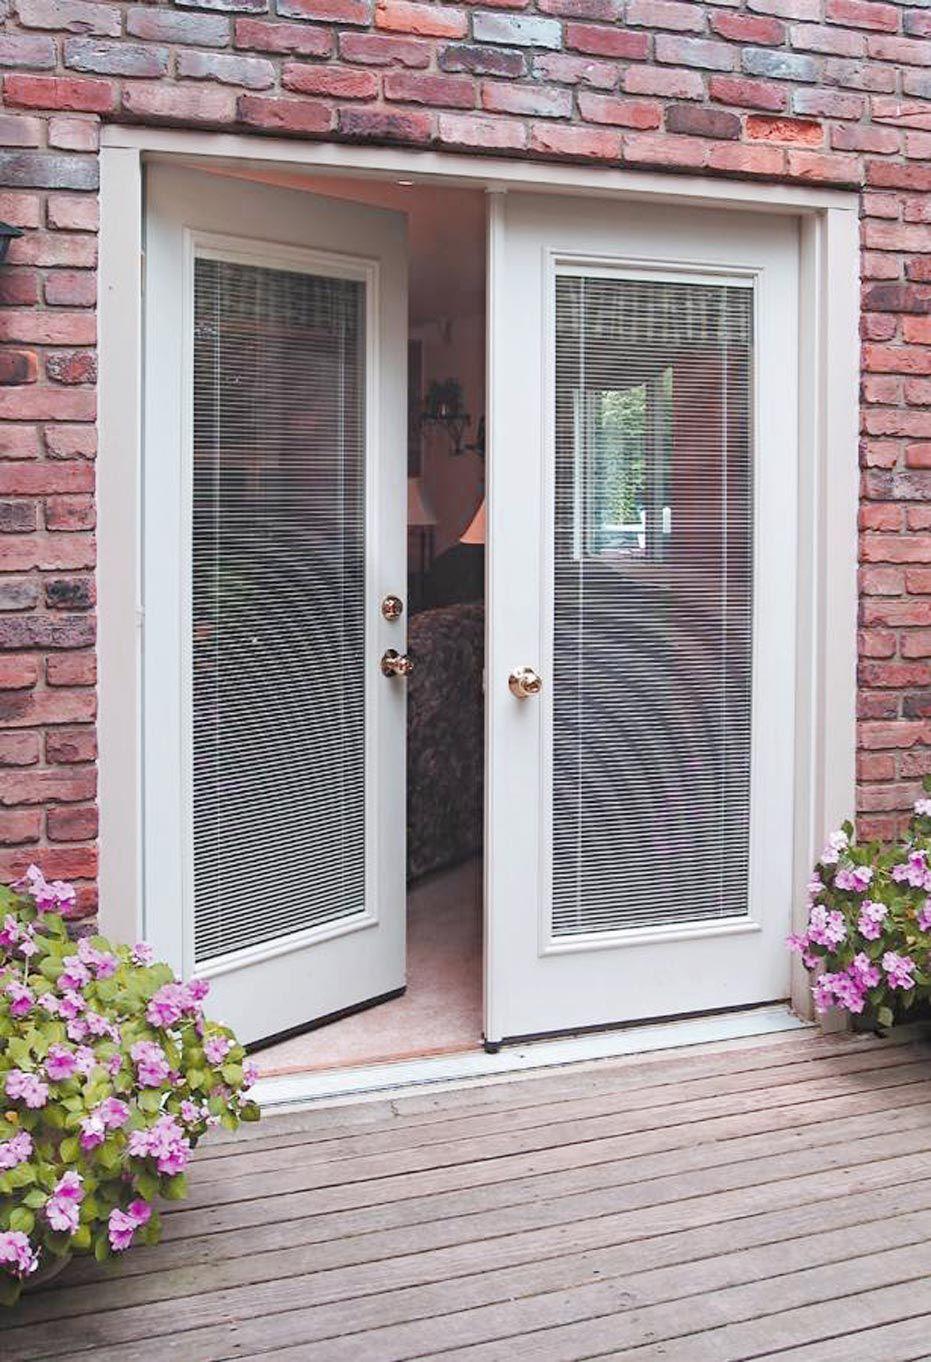 French Patio Doors With Built In Blinds 7 Dream Home French Doors Exterior French Doors Patio French Doors